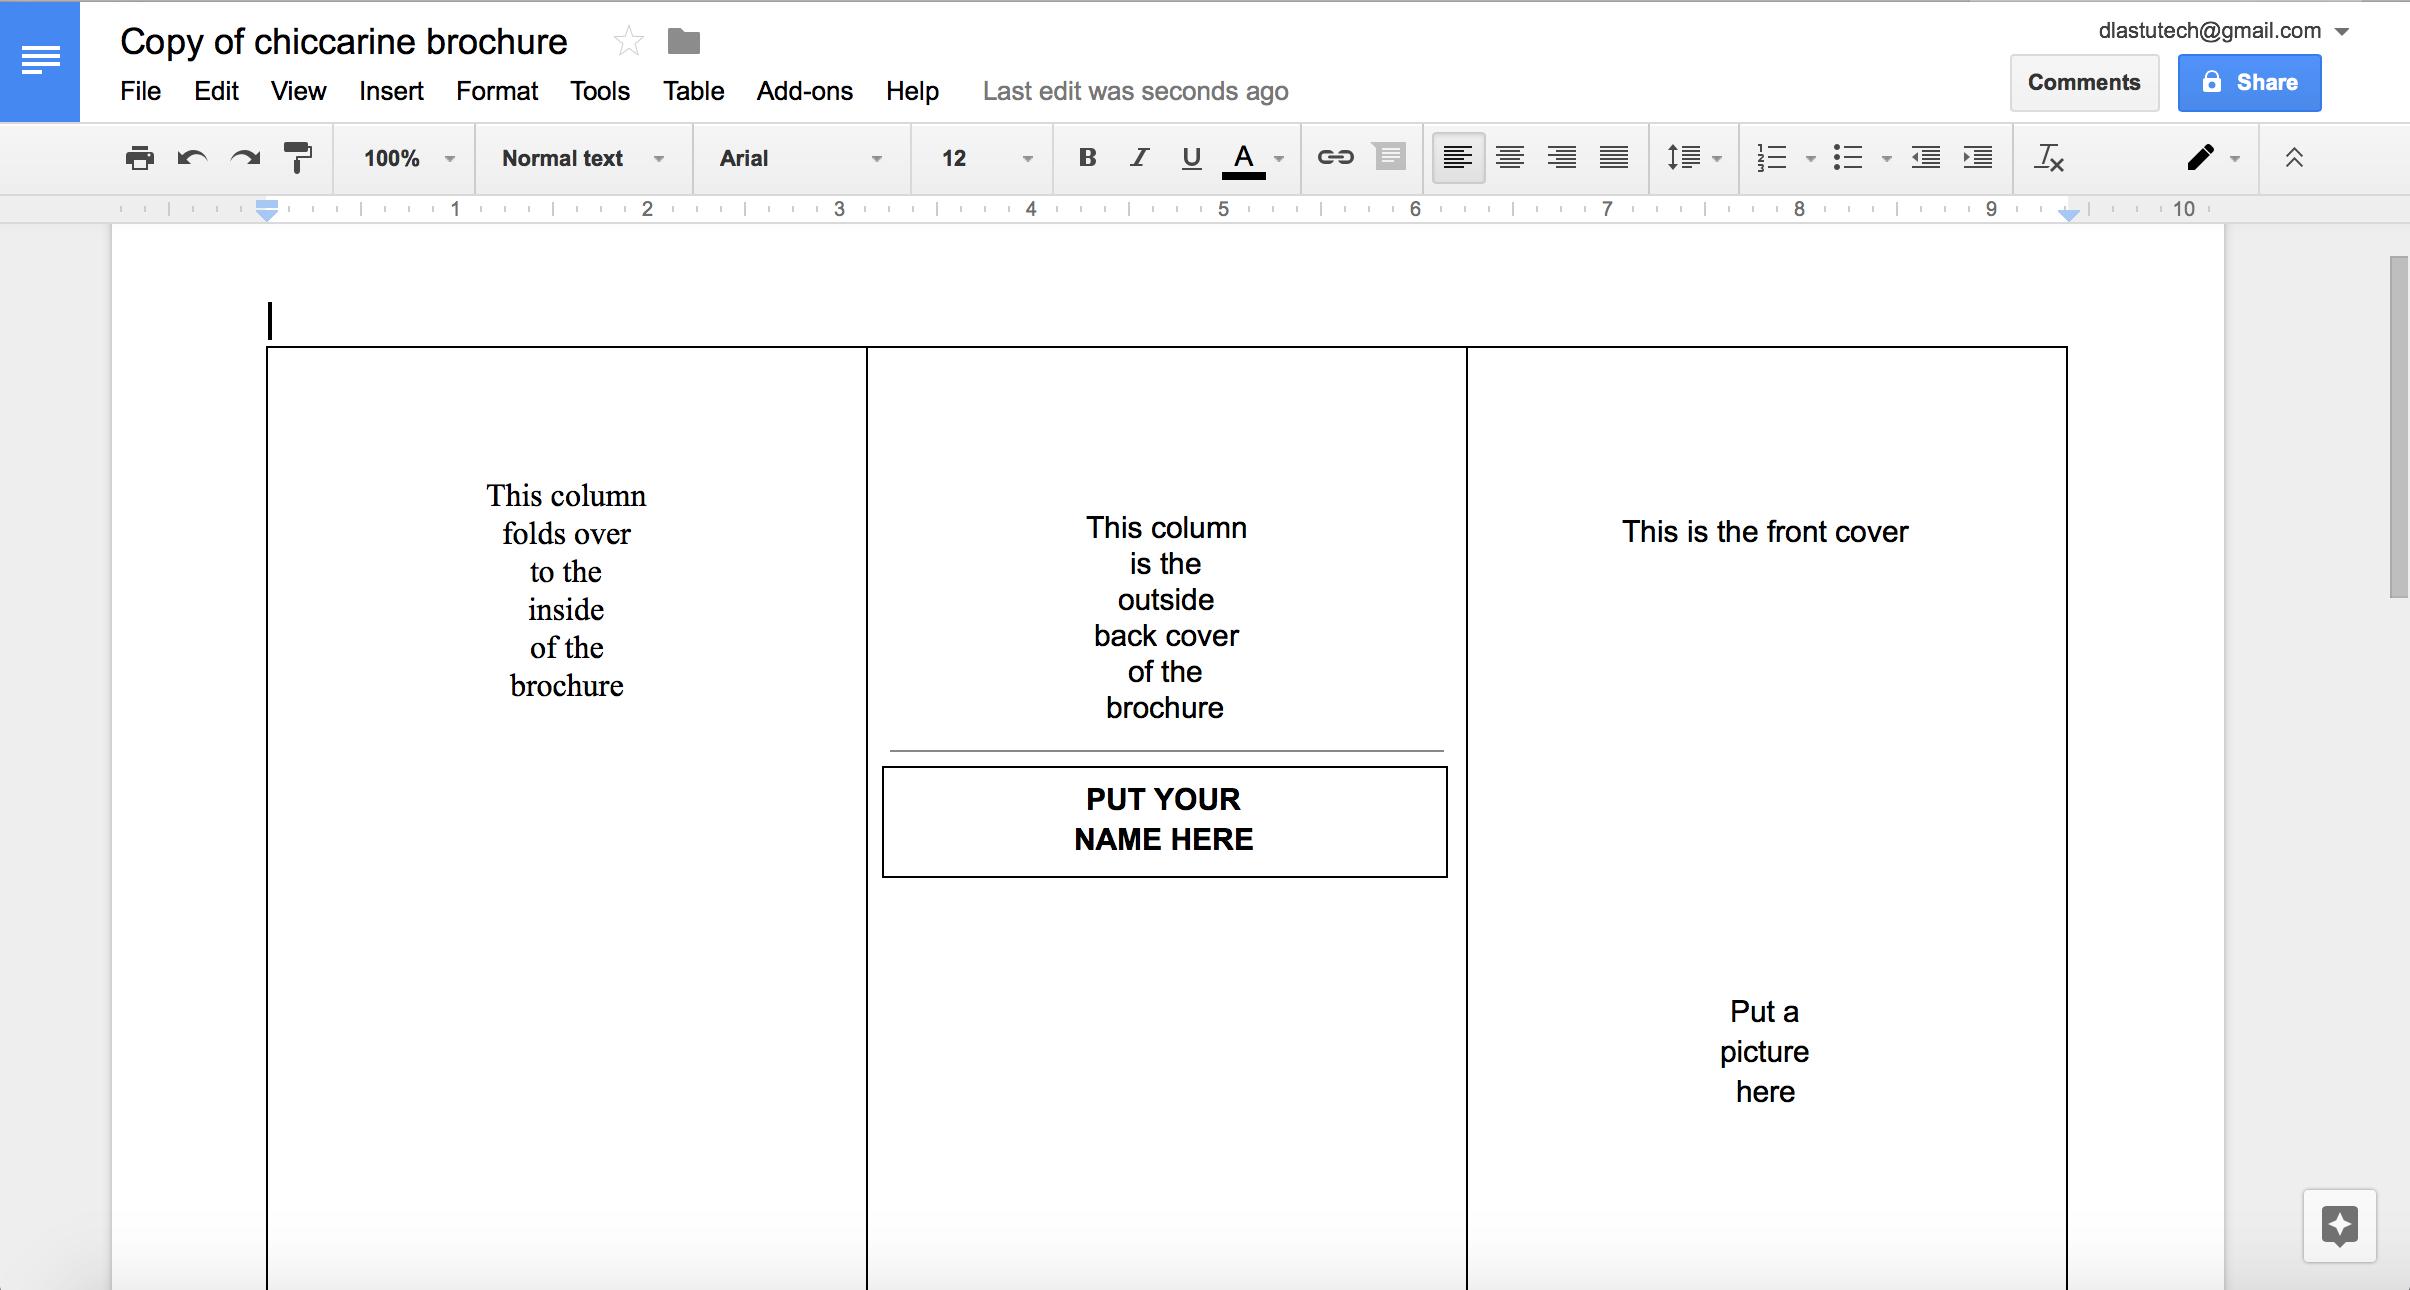 001 Brochure Templates Google Luxury Tutorial Making Using throughout Brochure Template For Google Docs